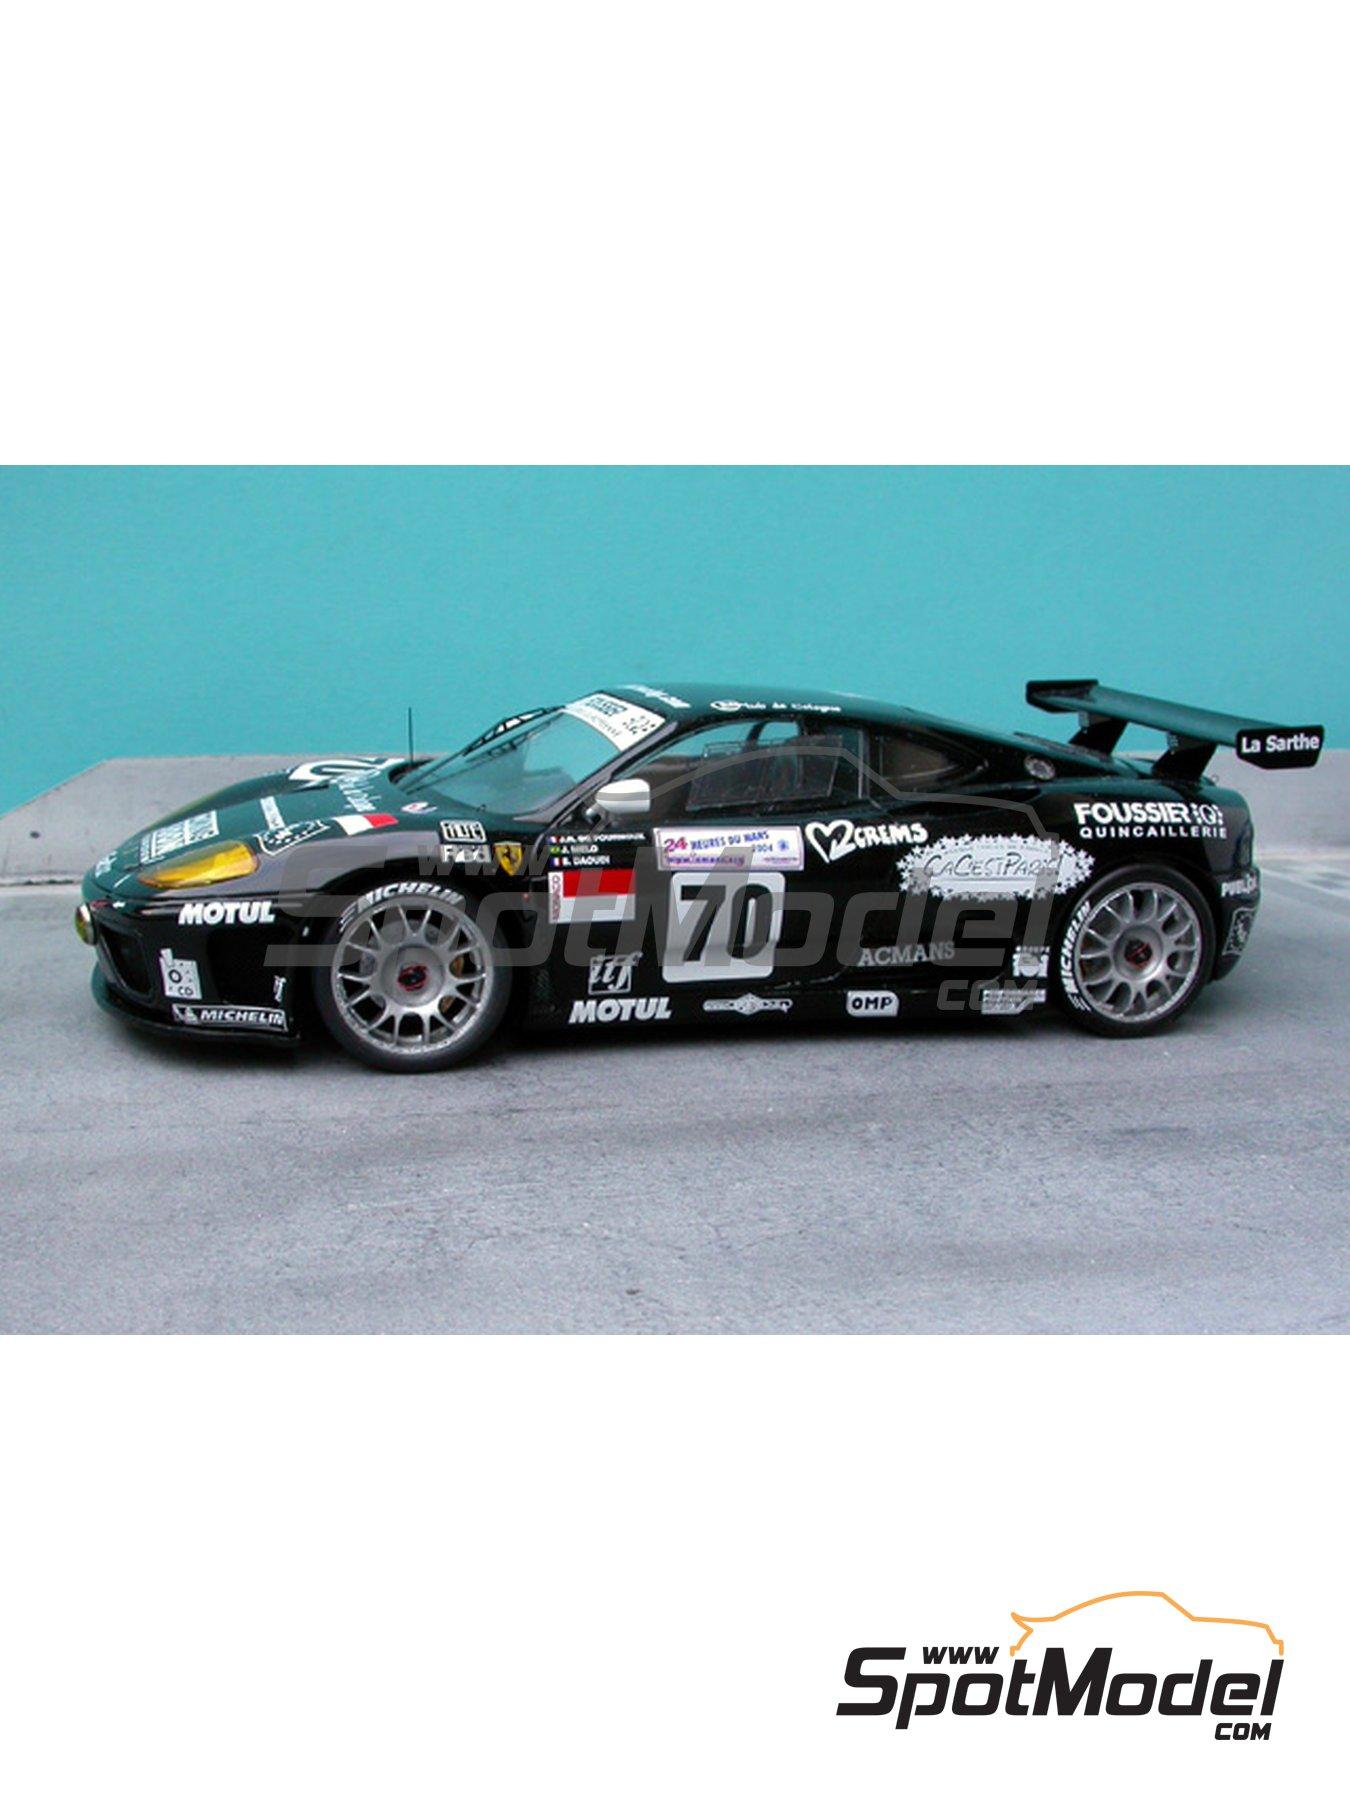 Ferrari 360 Modena JMB | Decoración en escala1/24 fabricado por Renaissance Models (ref.TK24-187) image